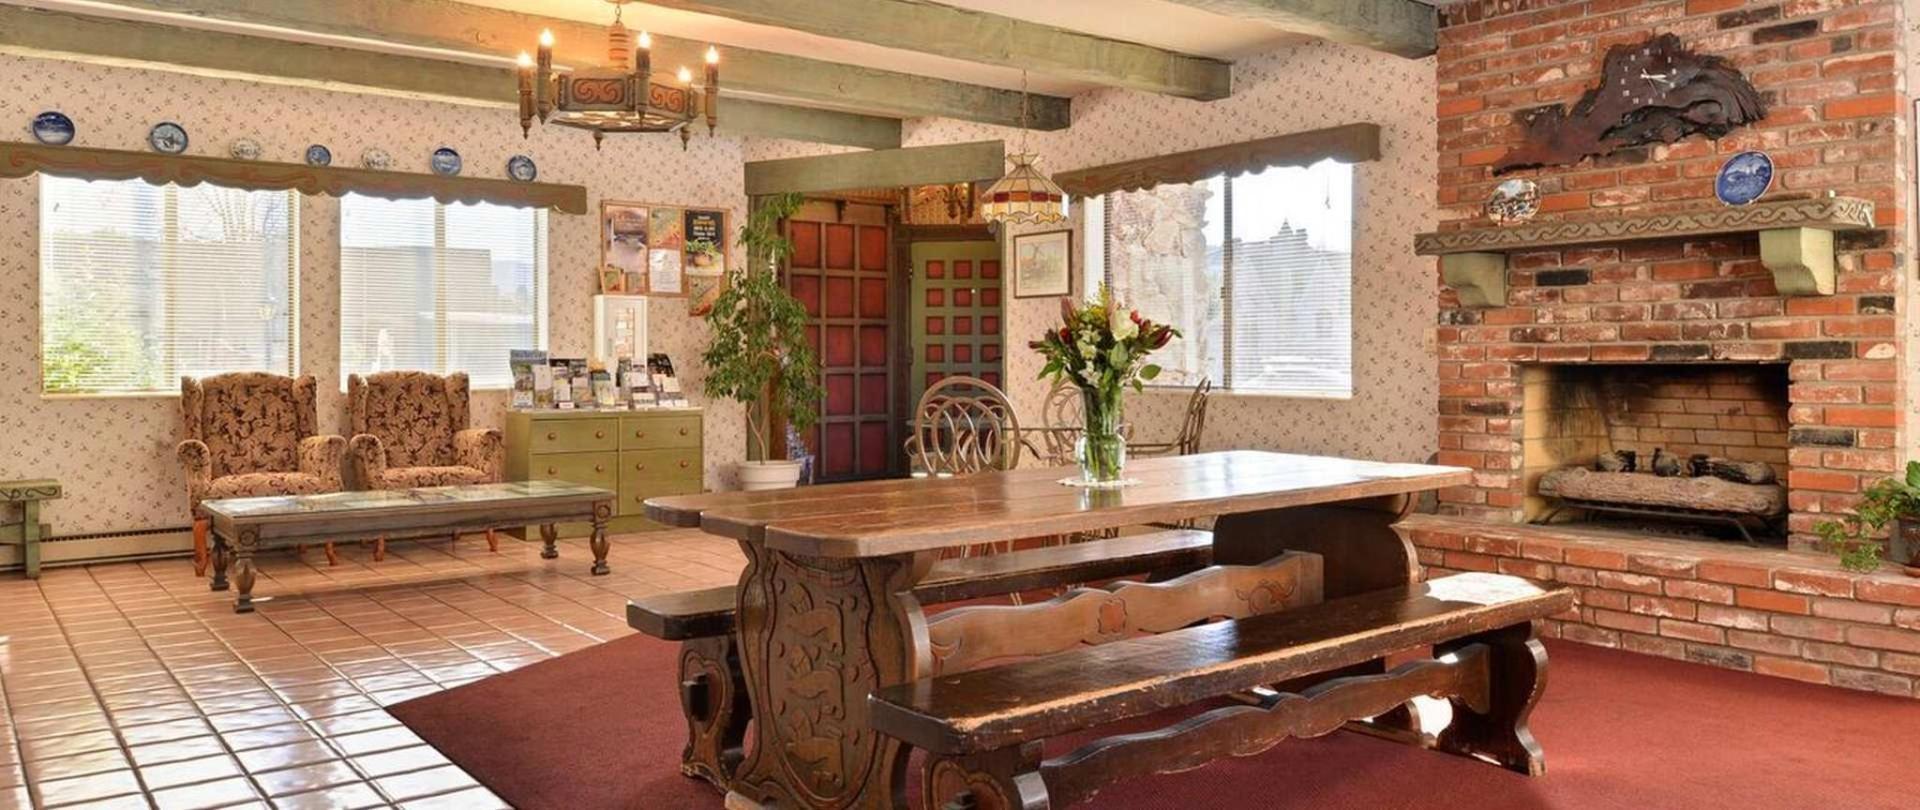 Svendsgaard's Lodge- Americas Best Value Inn & Suites